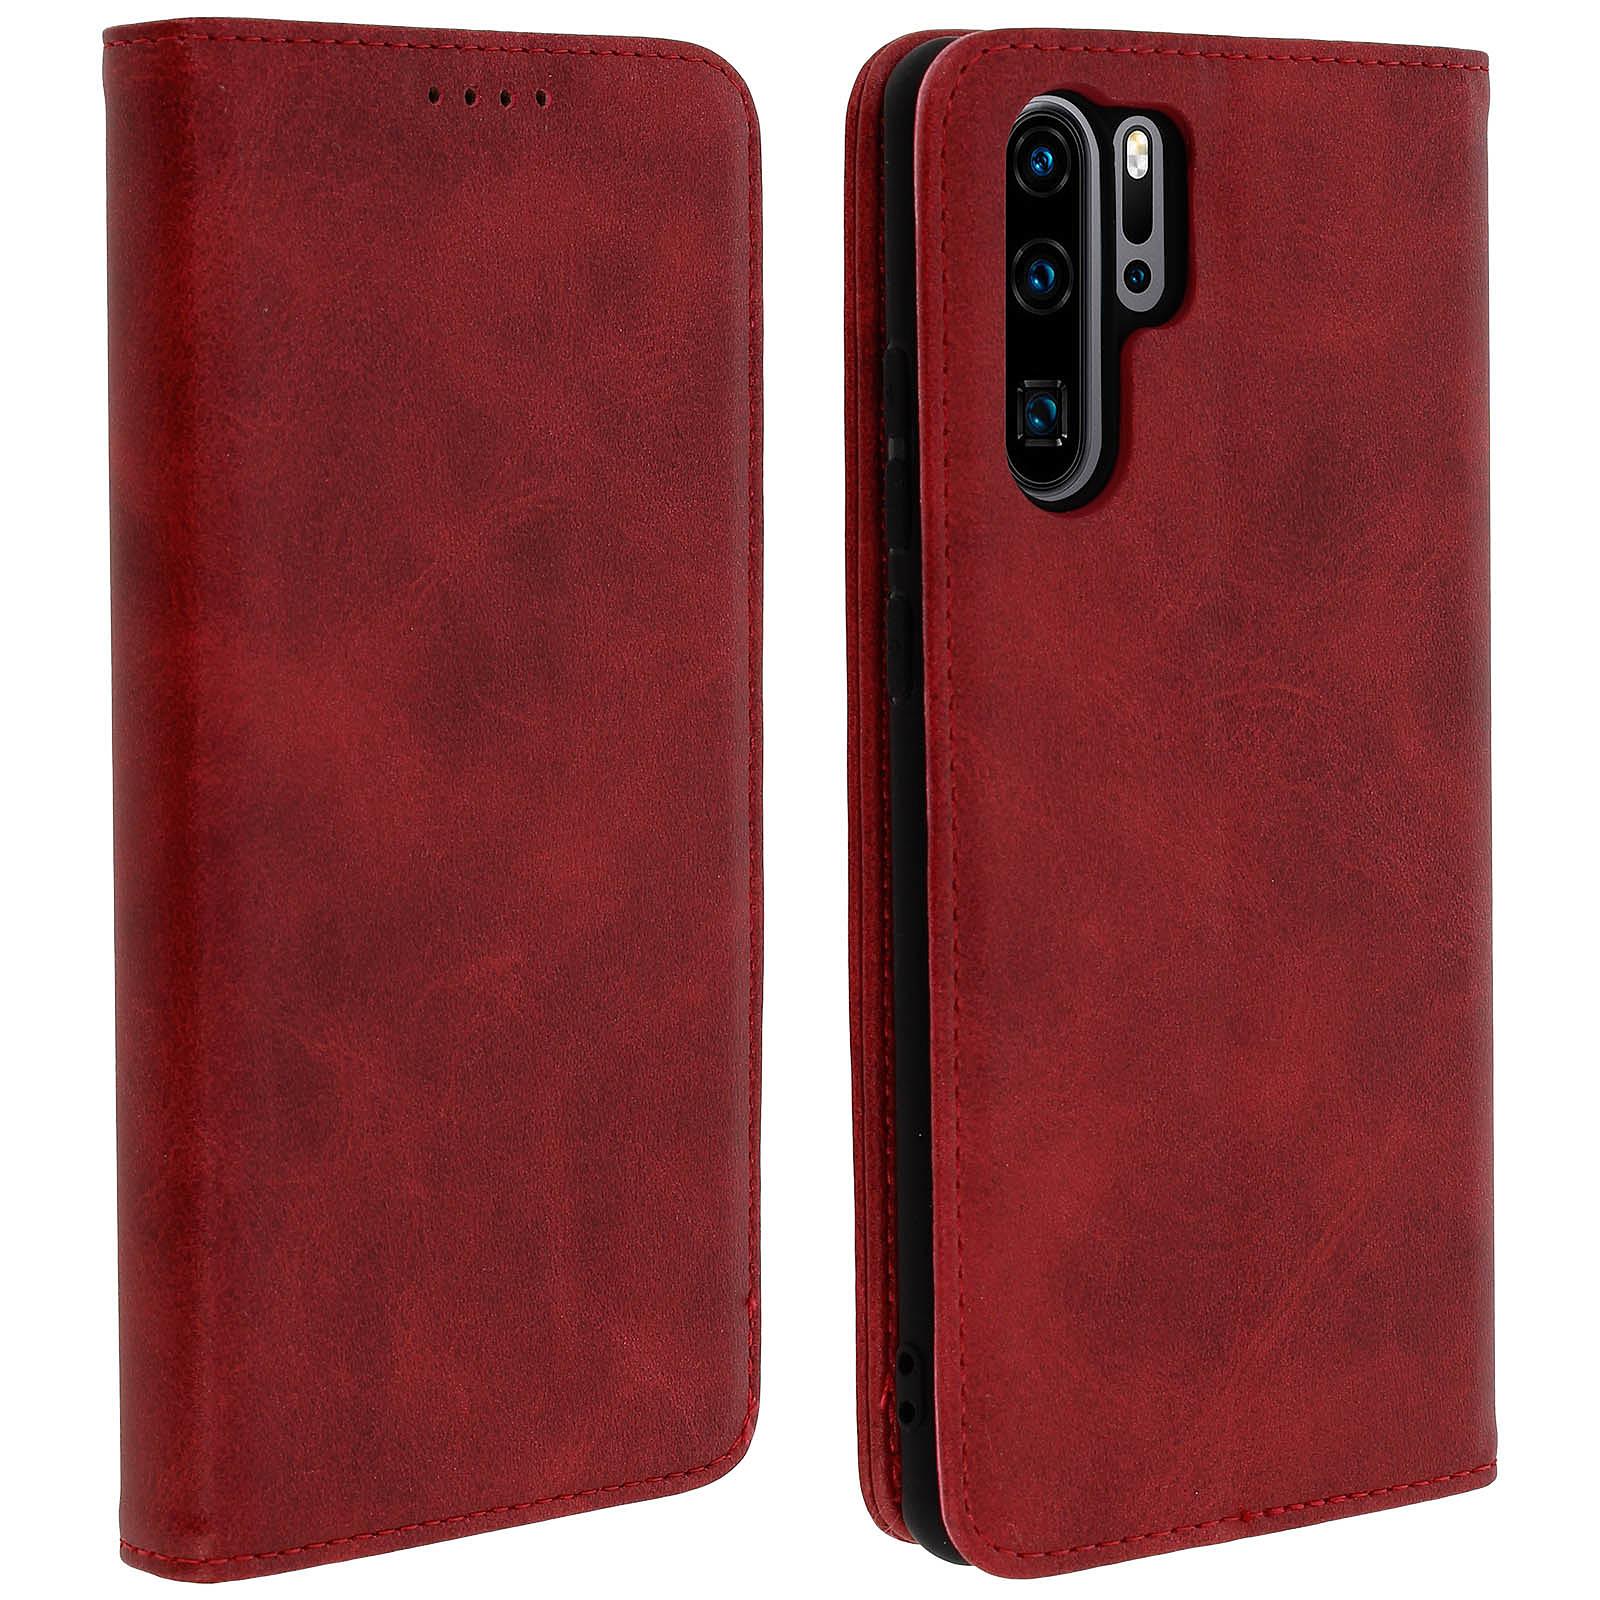 Avizar Etui folio Rouge Portefeuille pour Huawei P30 Pro